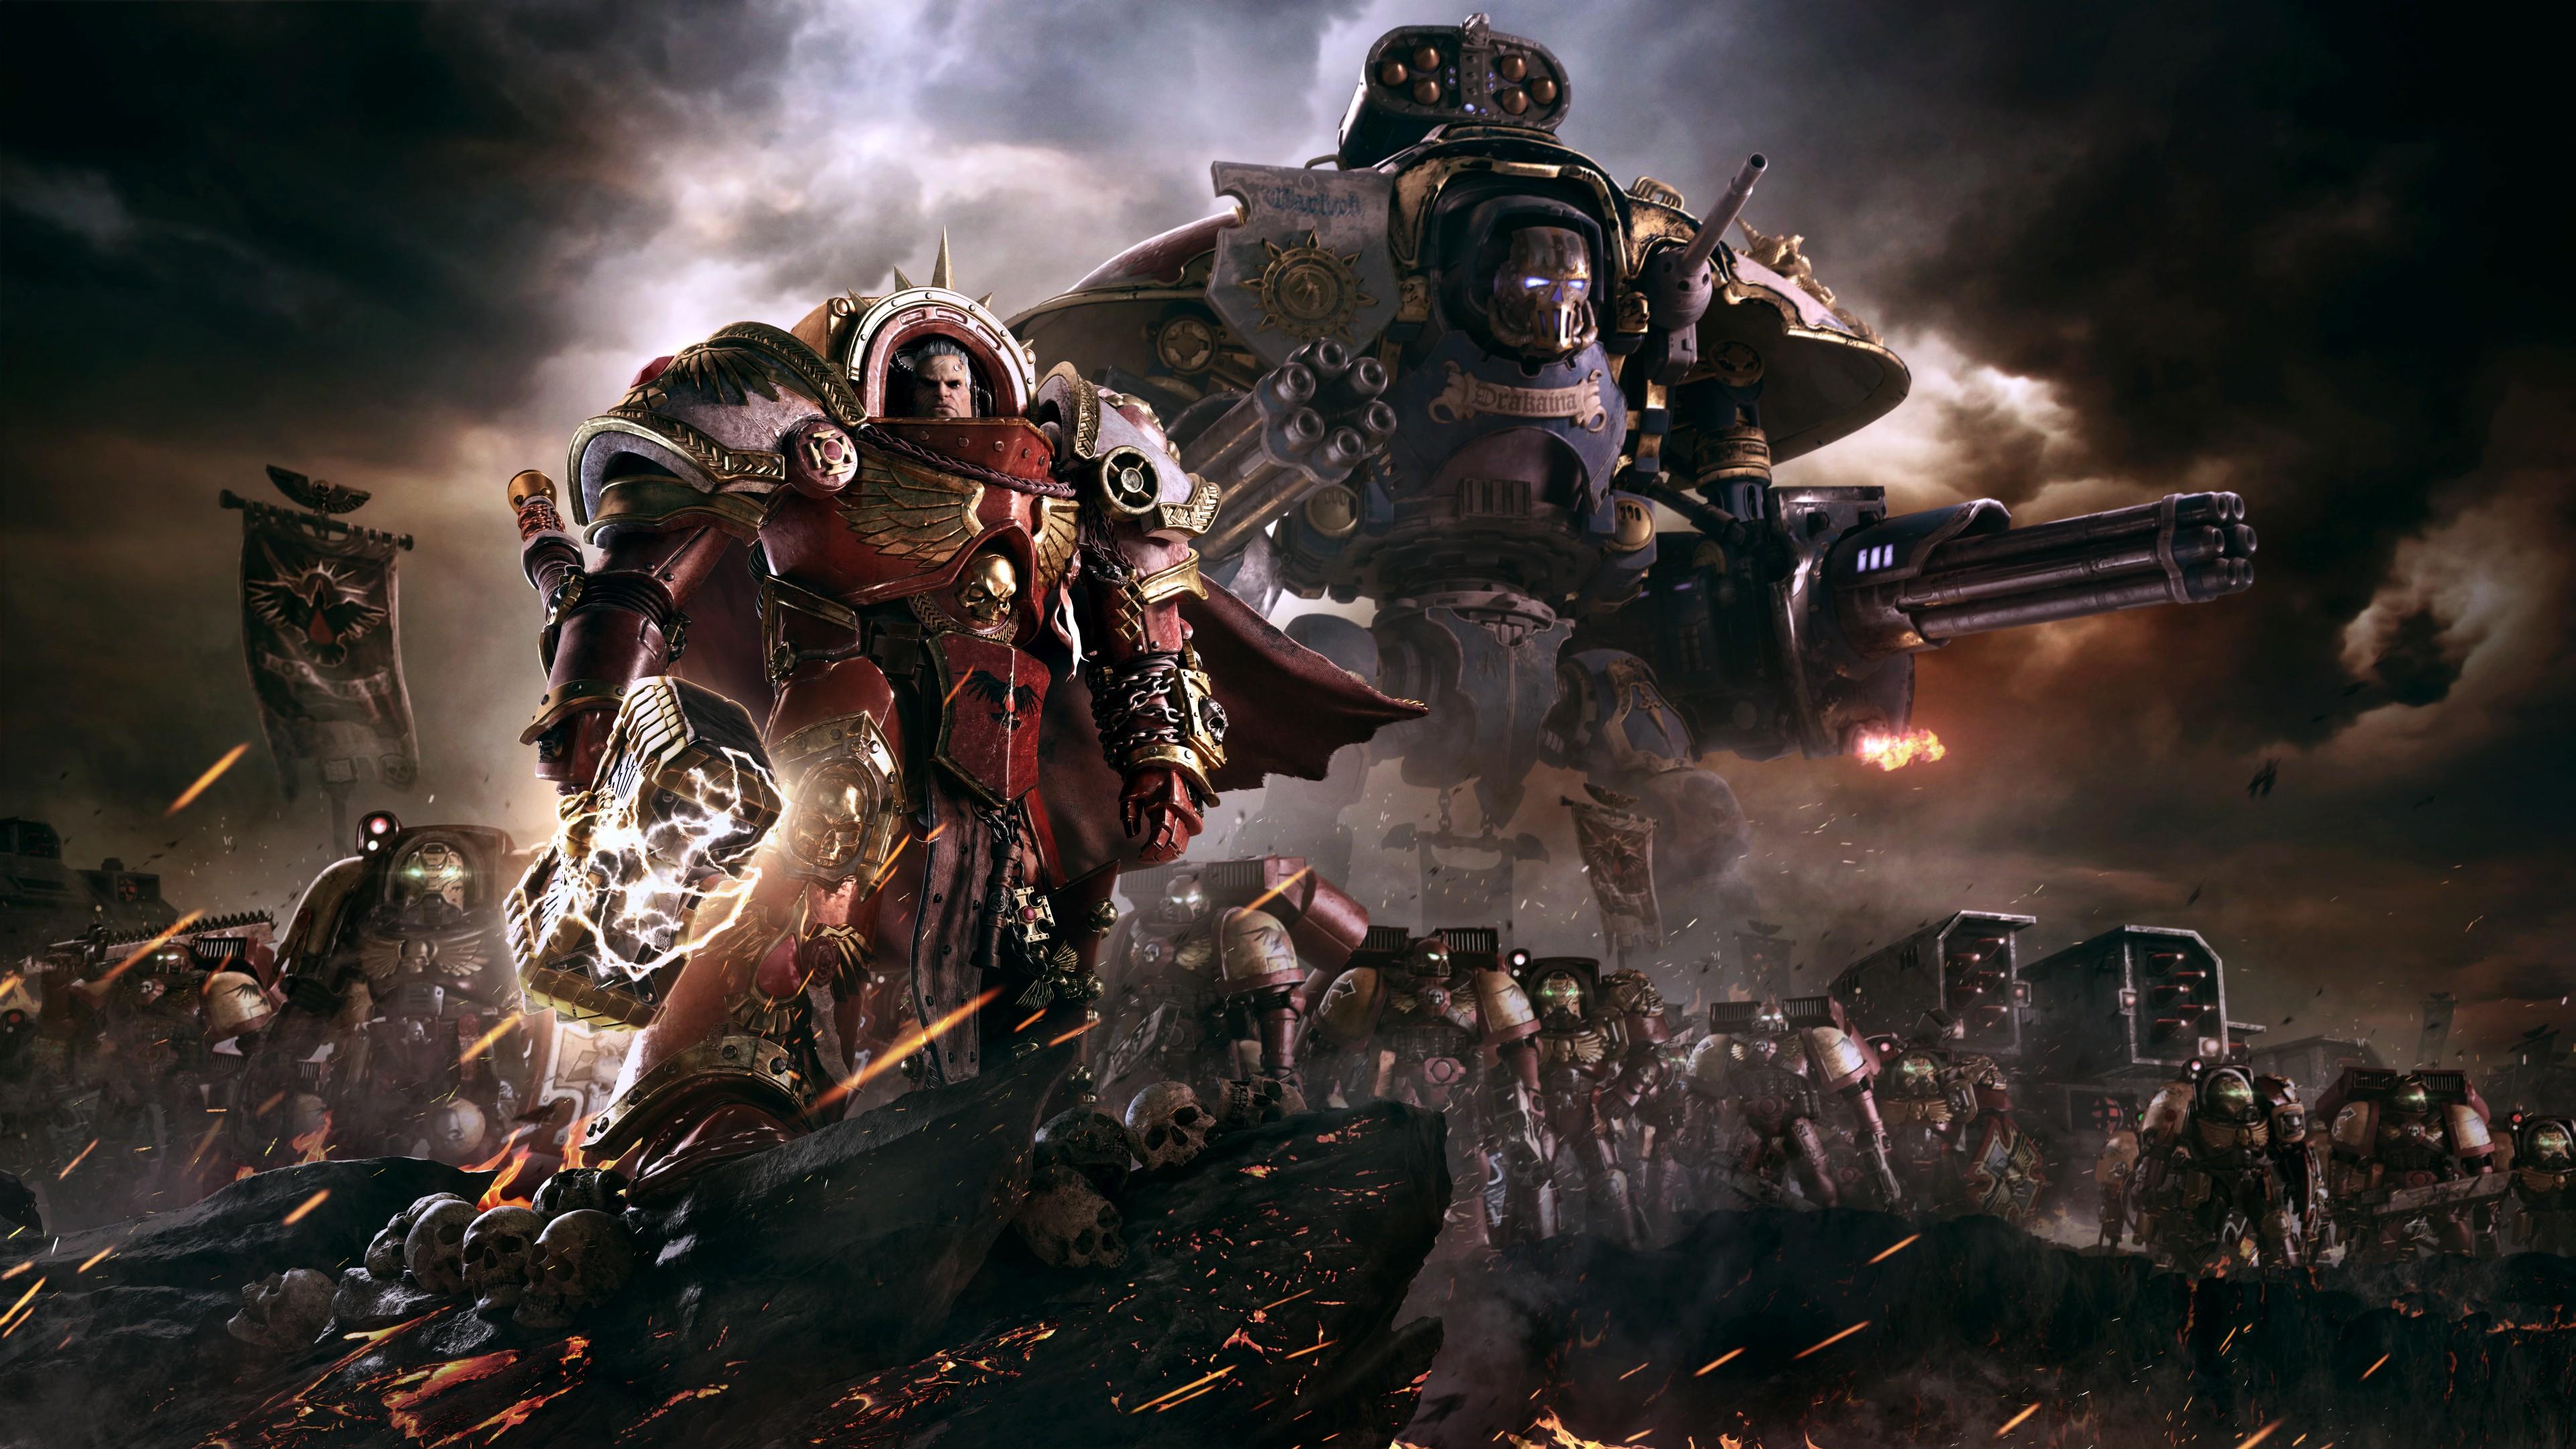 warhammer 40000 dawn of war iii 1536010706 - Warhammer 40000 Dawn Of War III - warhammer 40000 dawn of war iii wallpapers, pc games wallpapers, games wallpapers